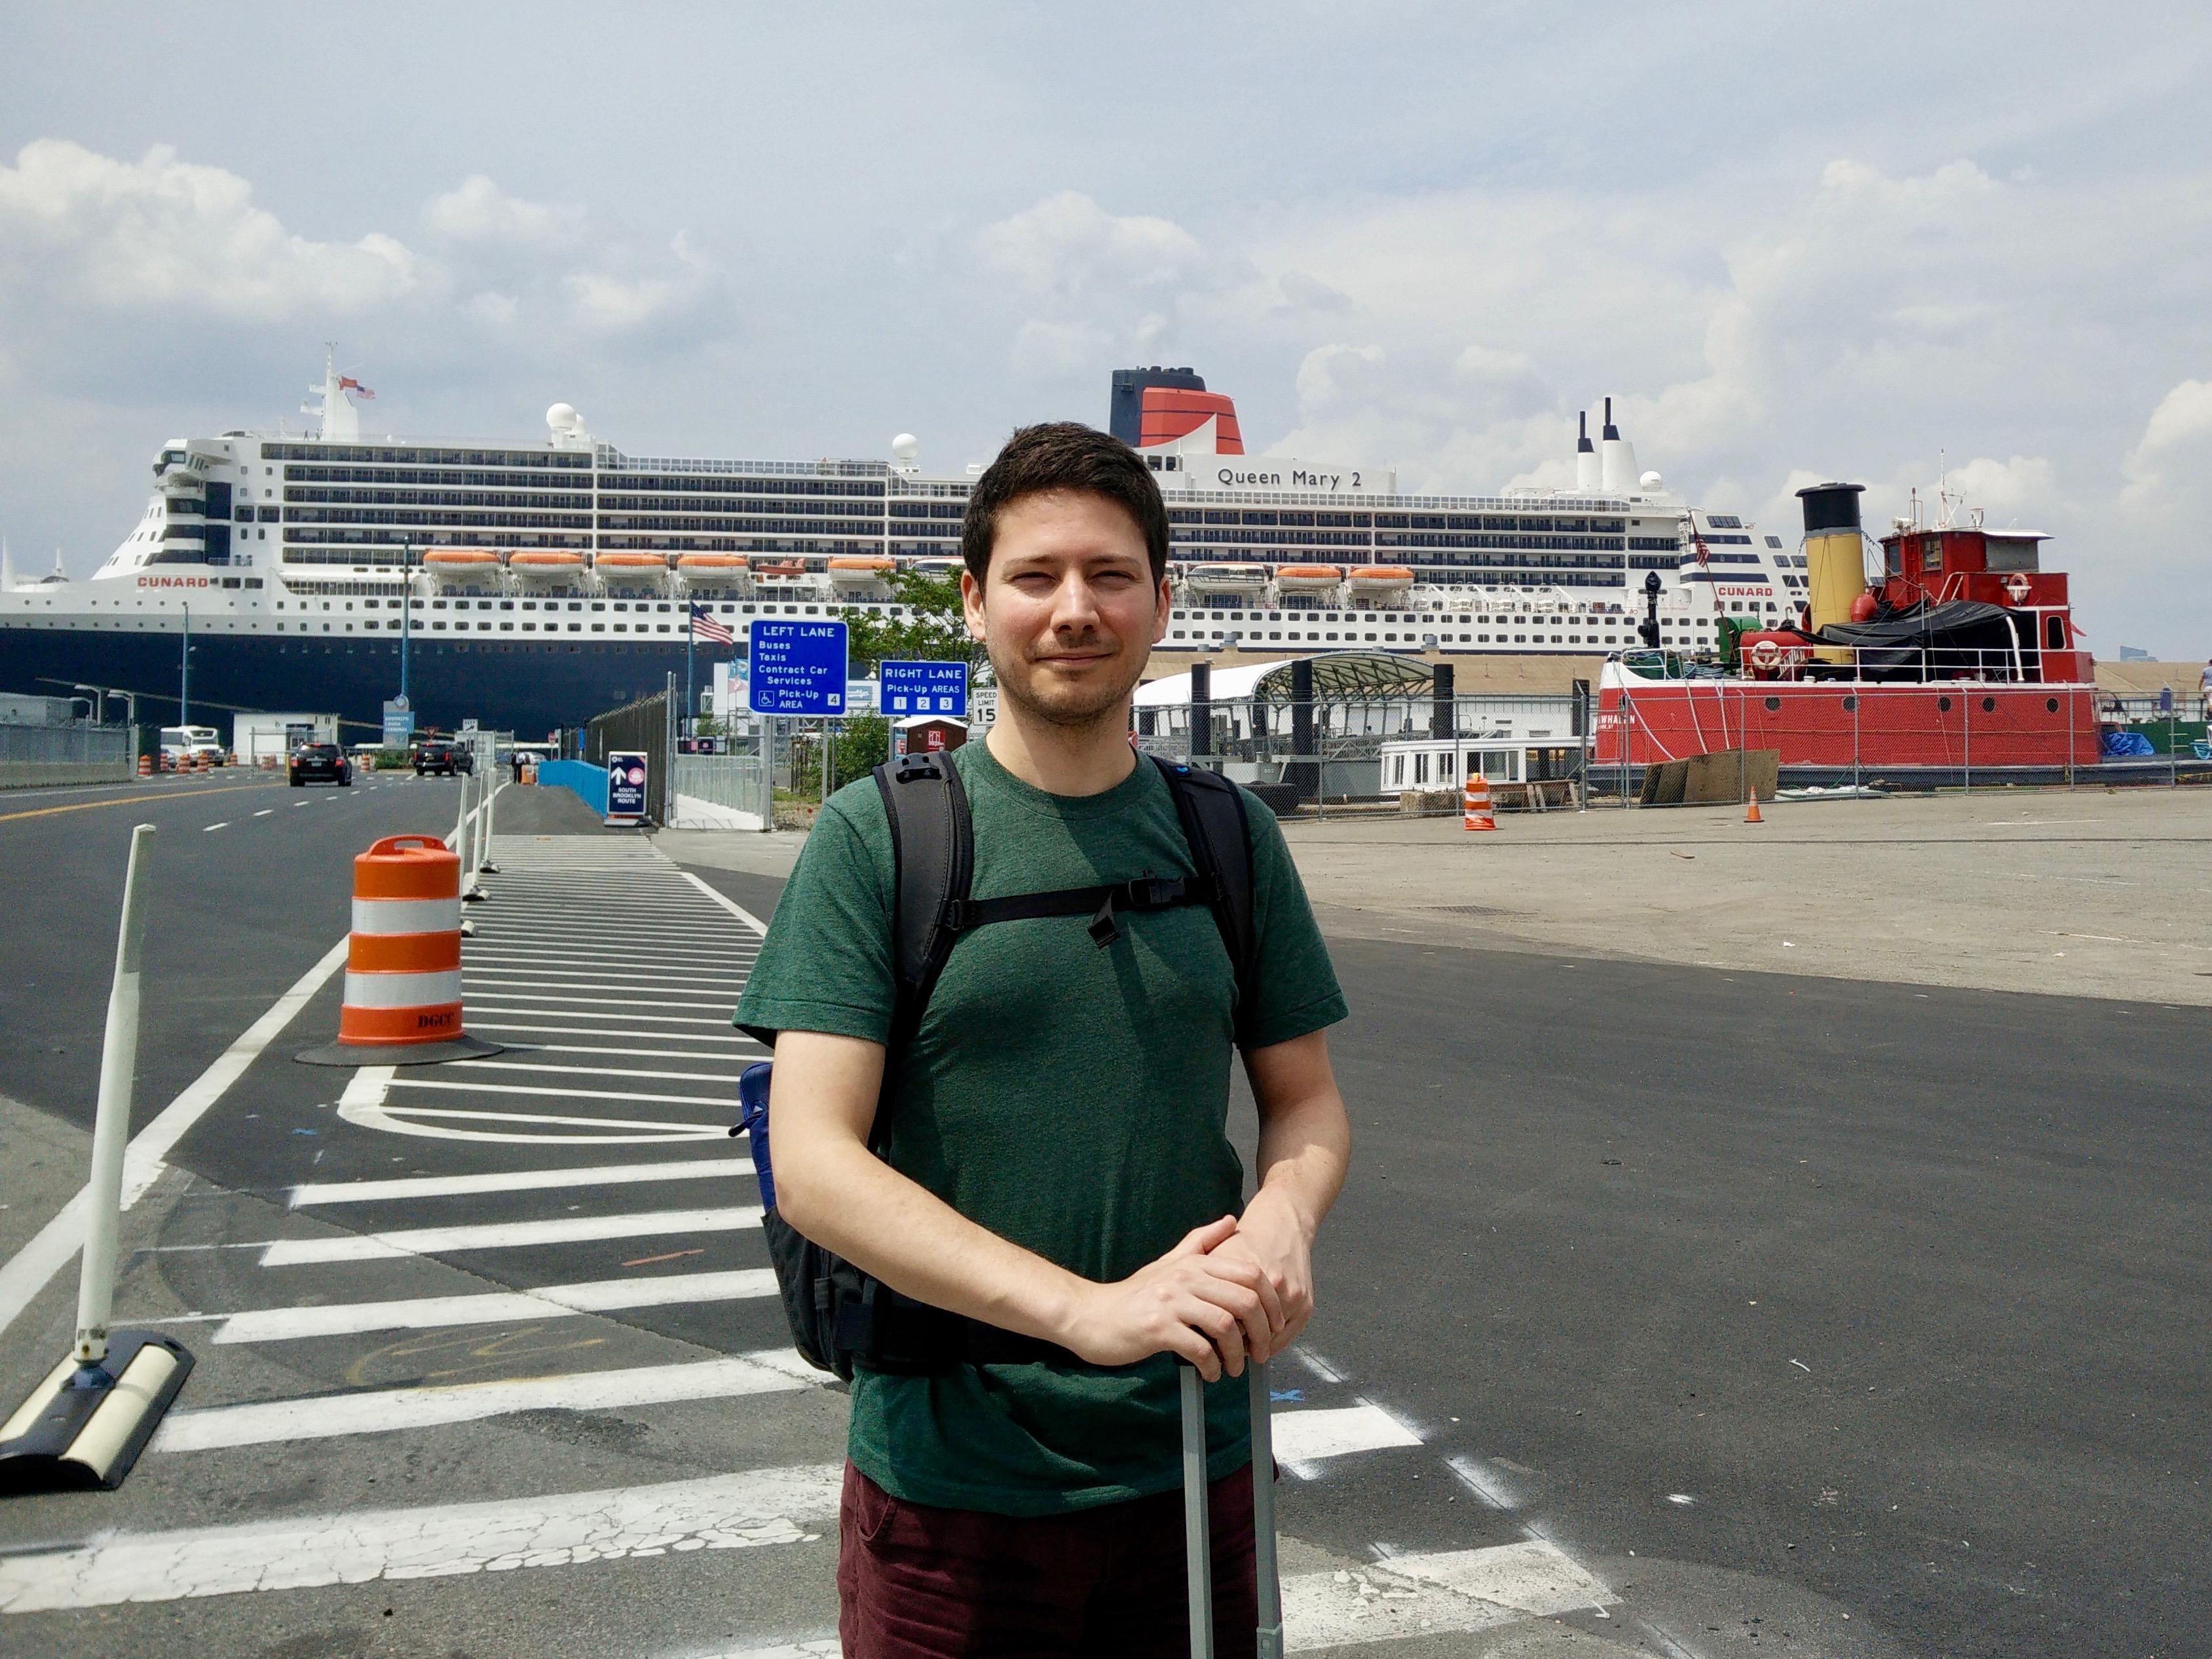 Crossing The Atlantic